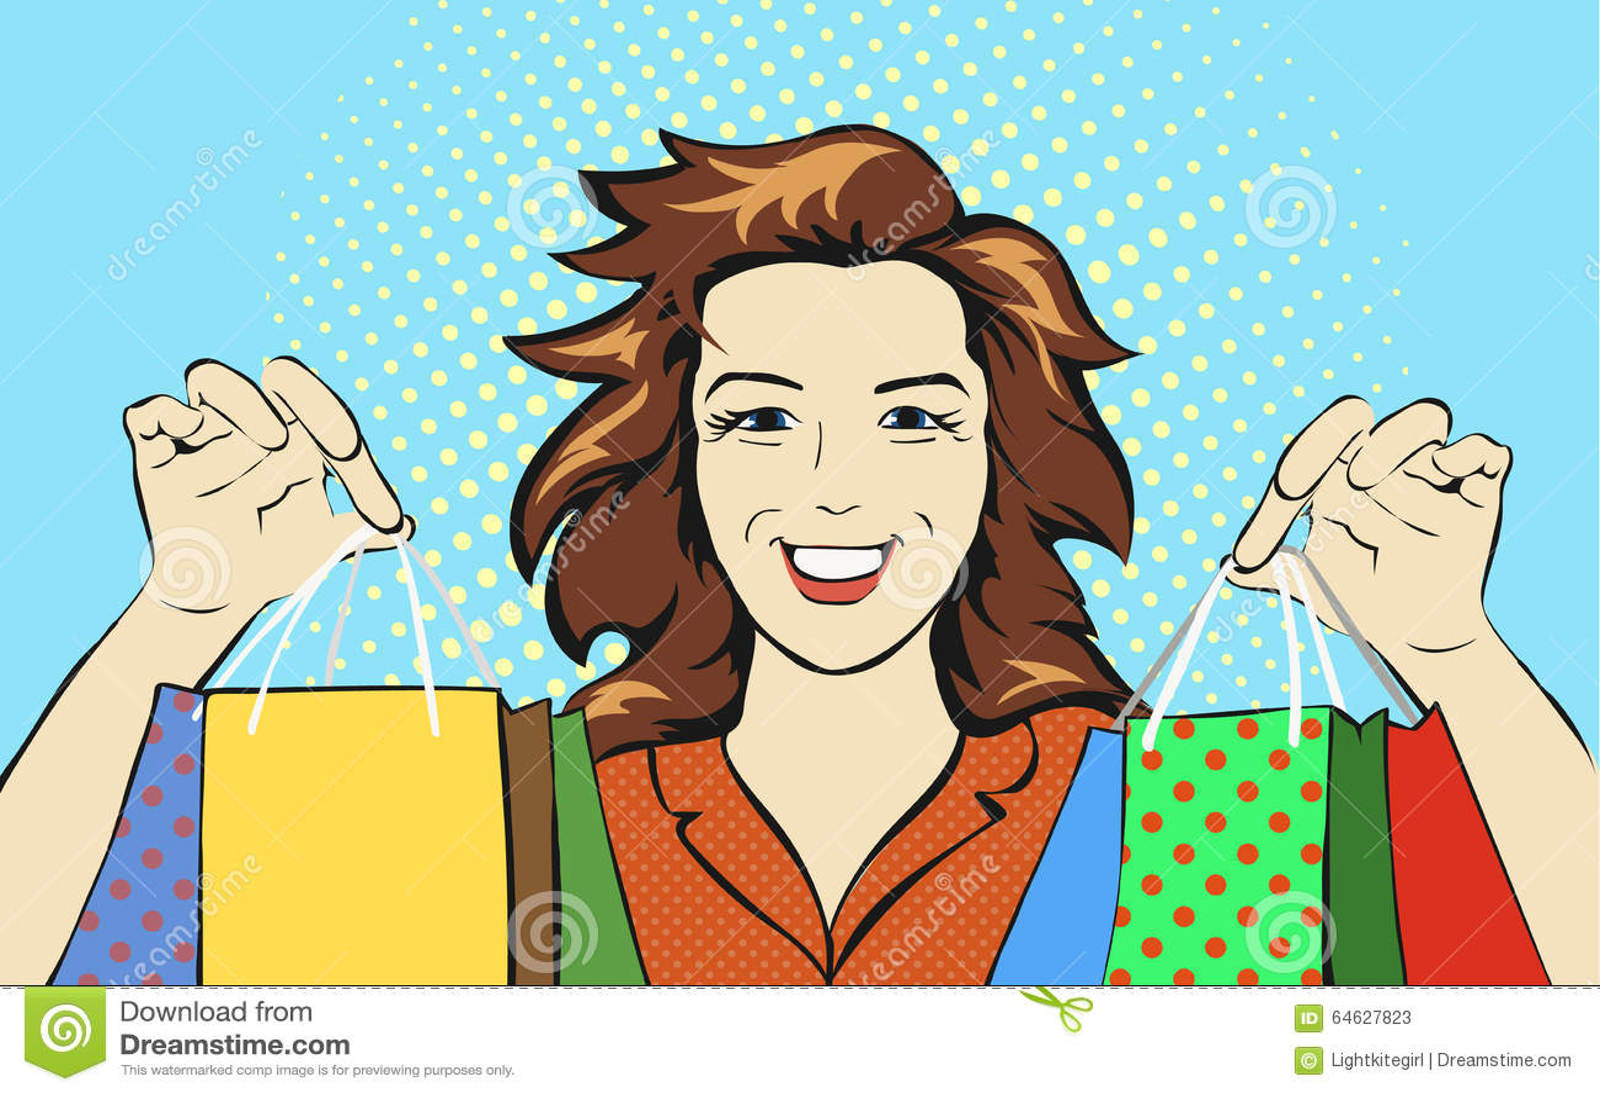 woman with a shopping bag discounts pop art retro stock